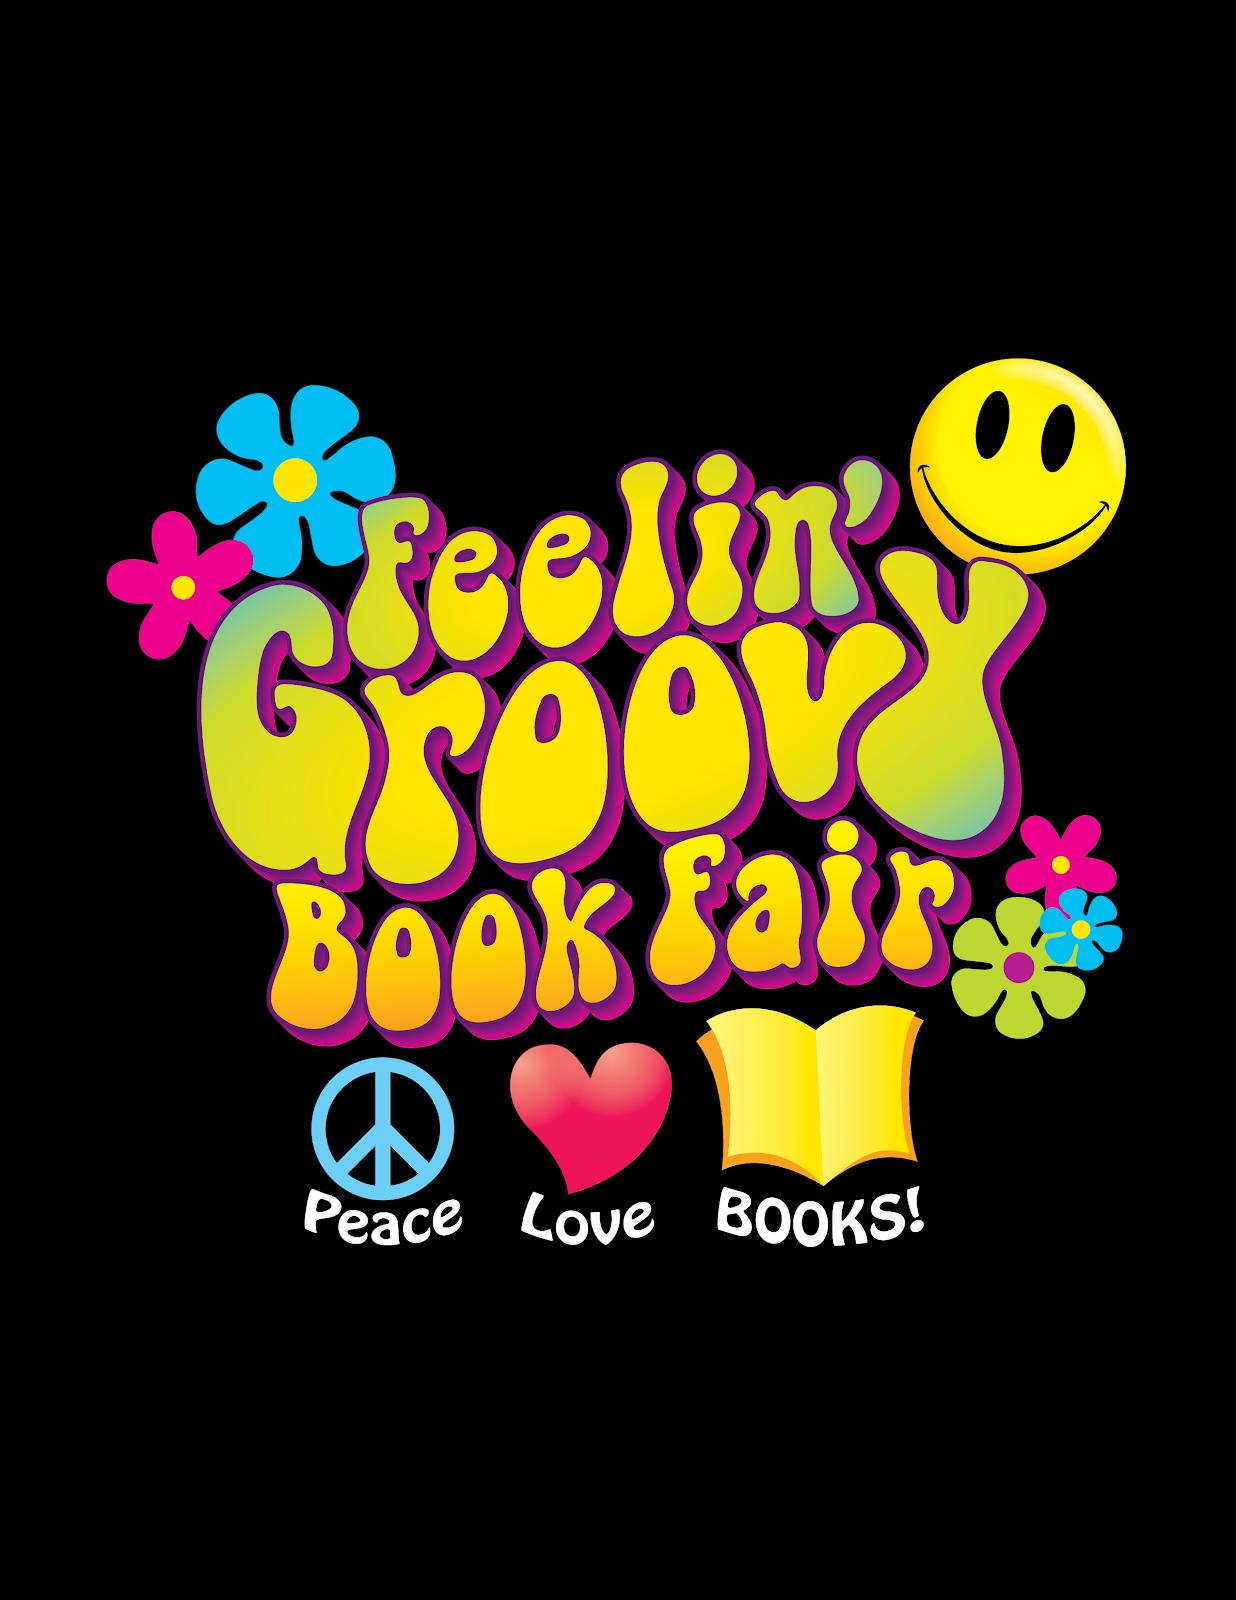 http://bookfairs.scholastic.com/bookfairs/cptoolkit/assetuploads/171213_feelin'_groovy_book_fair_clip_art_logo.png